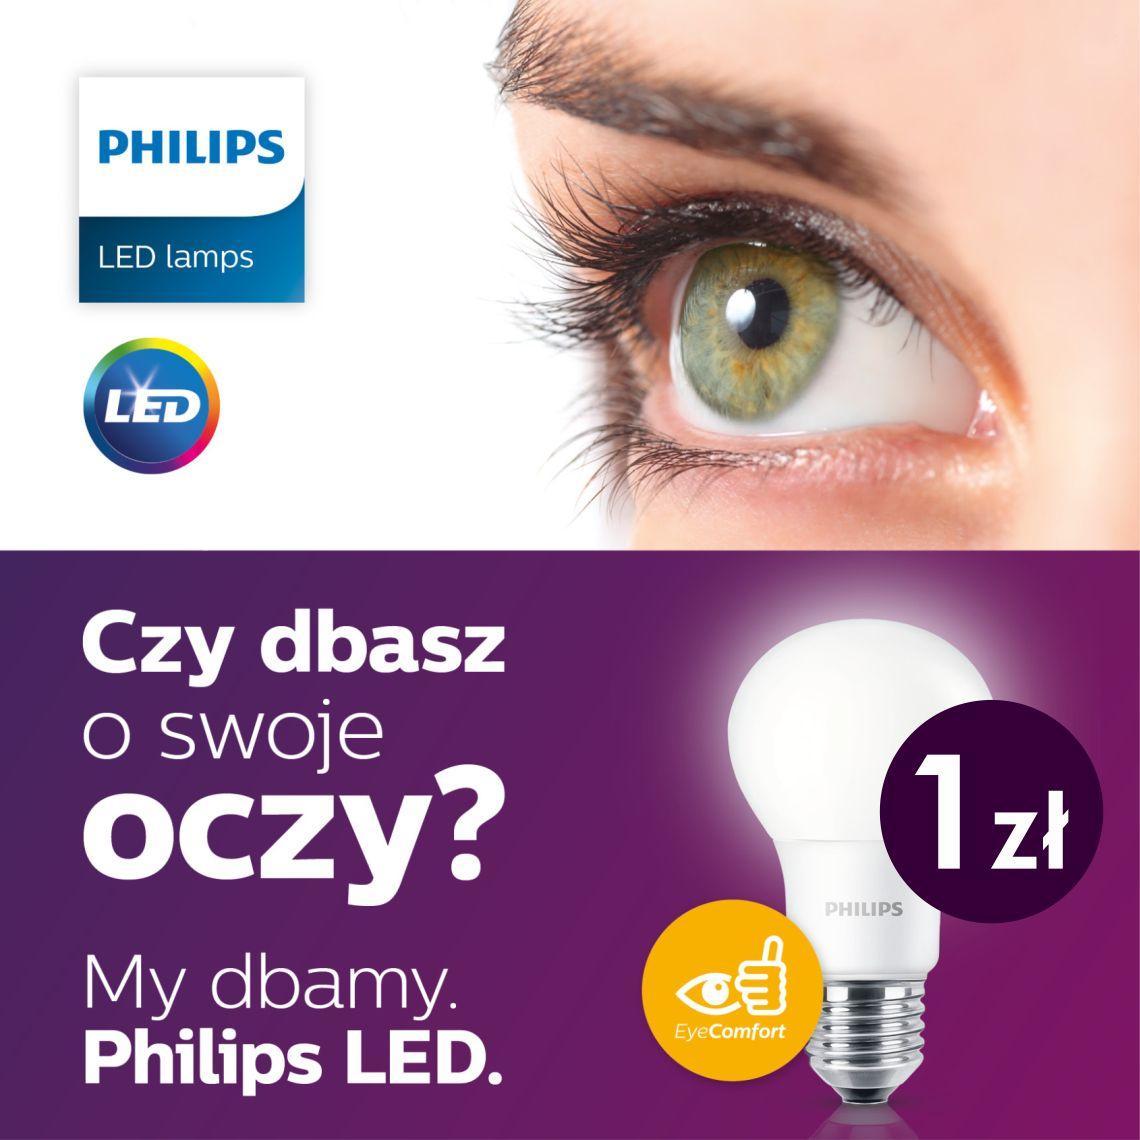 philips promocja